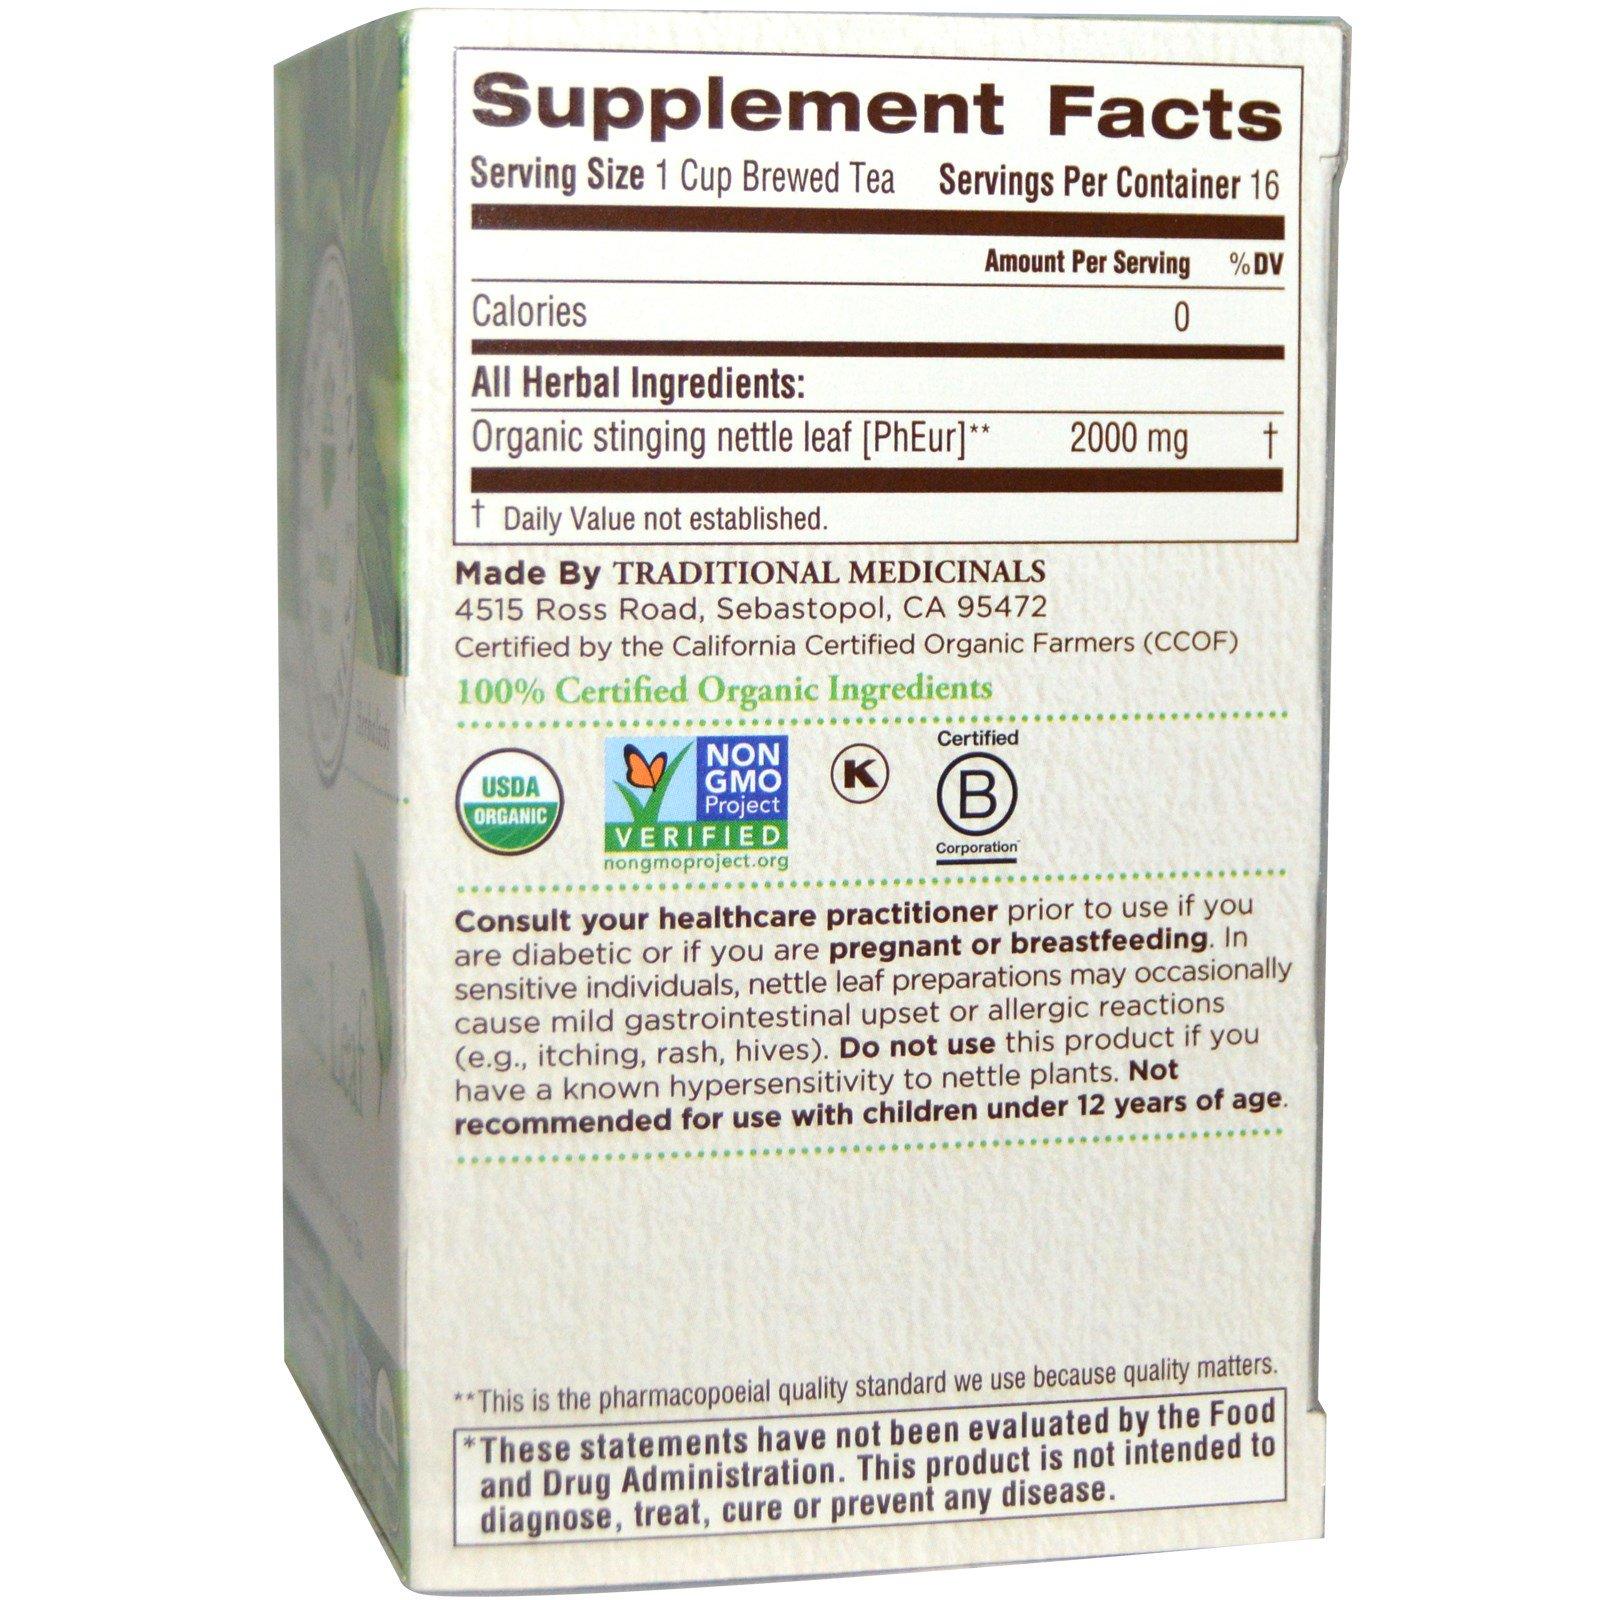 Herbal Teas, Organic Nettle Leaf